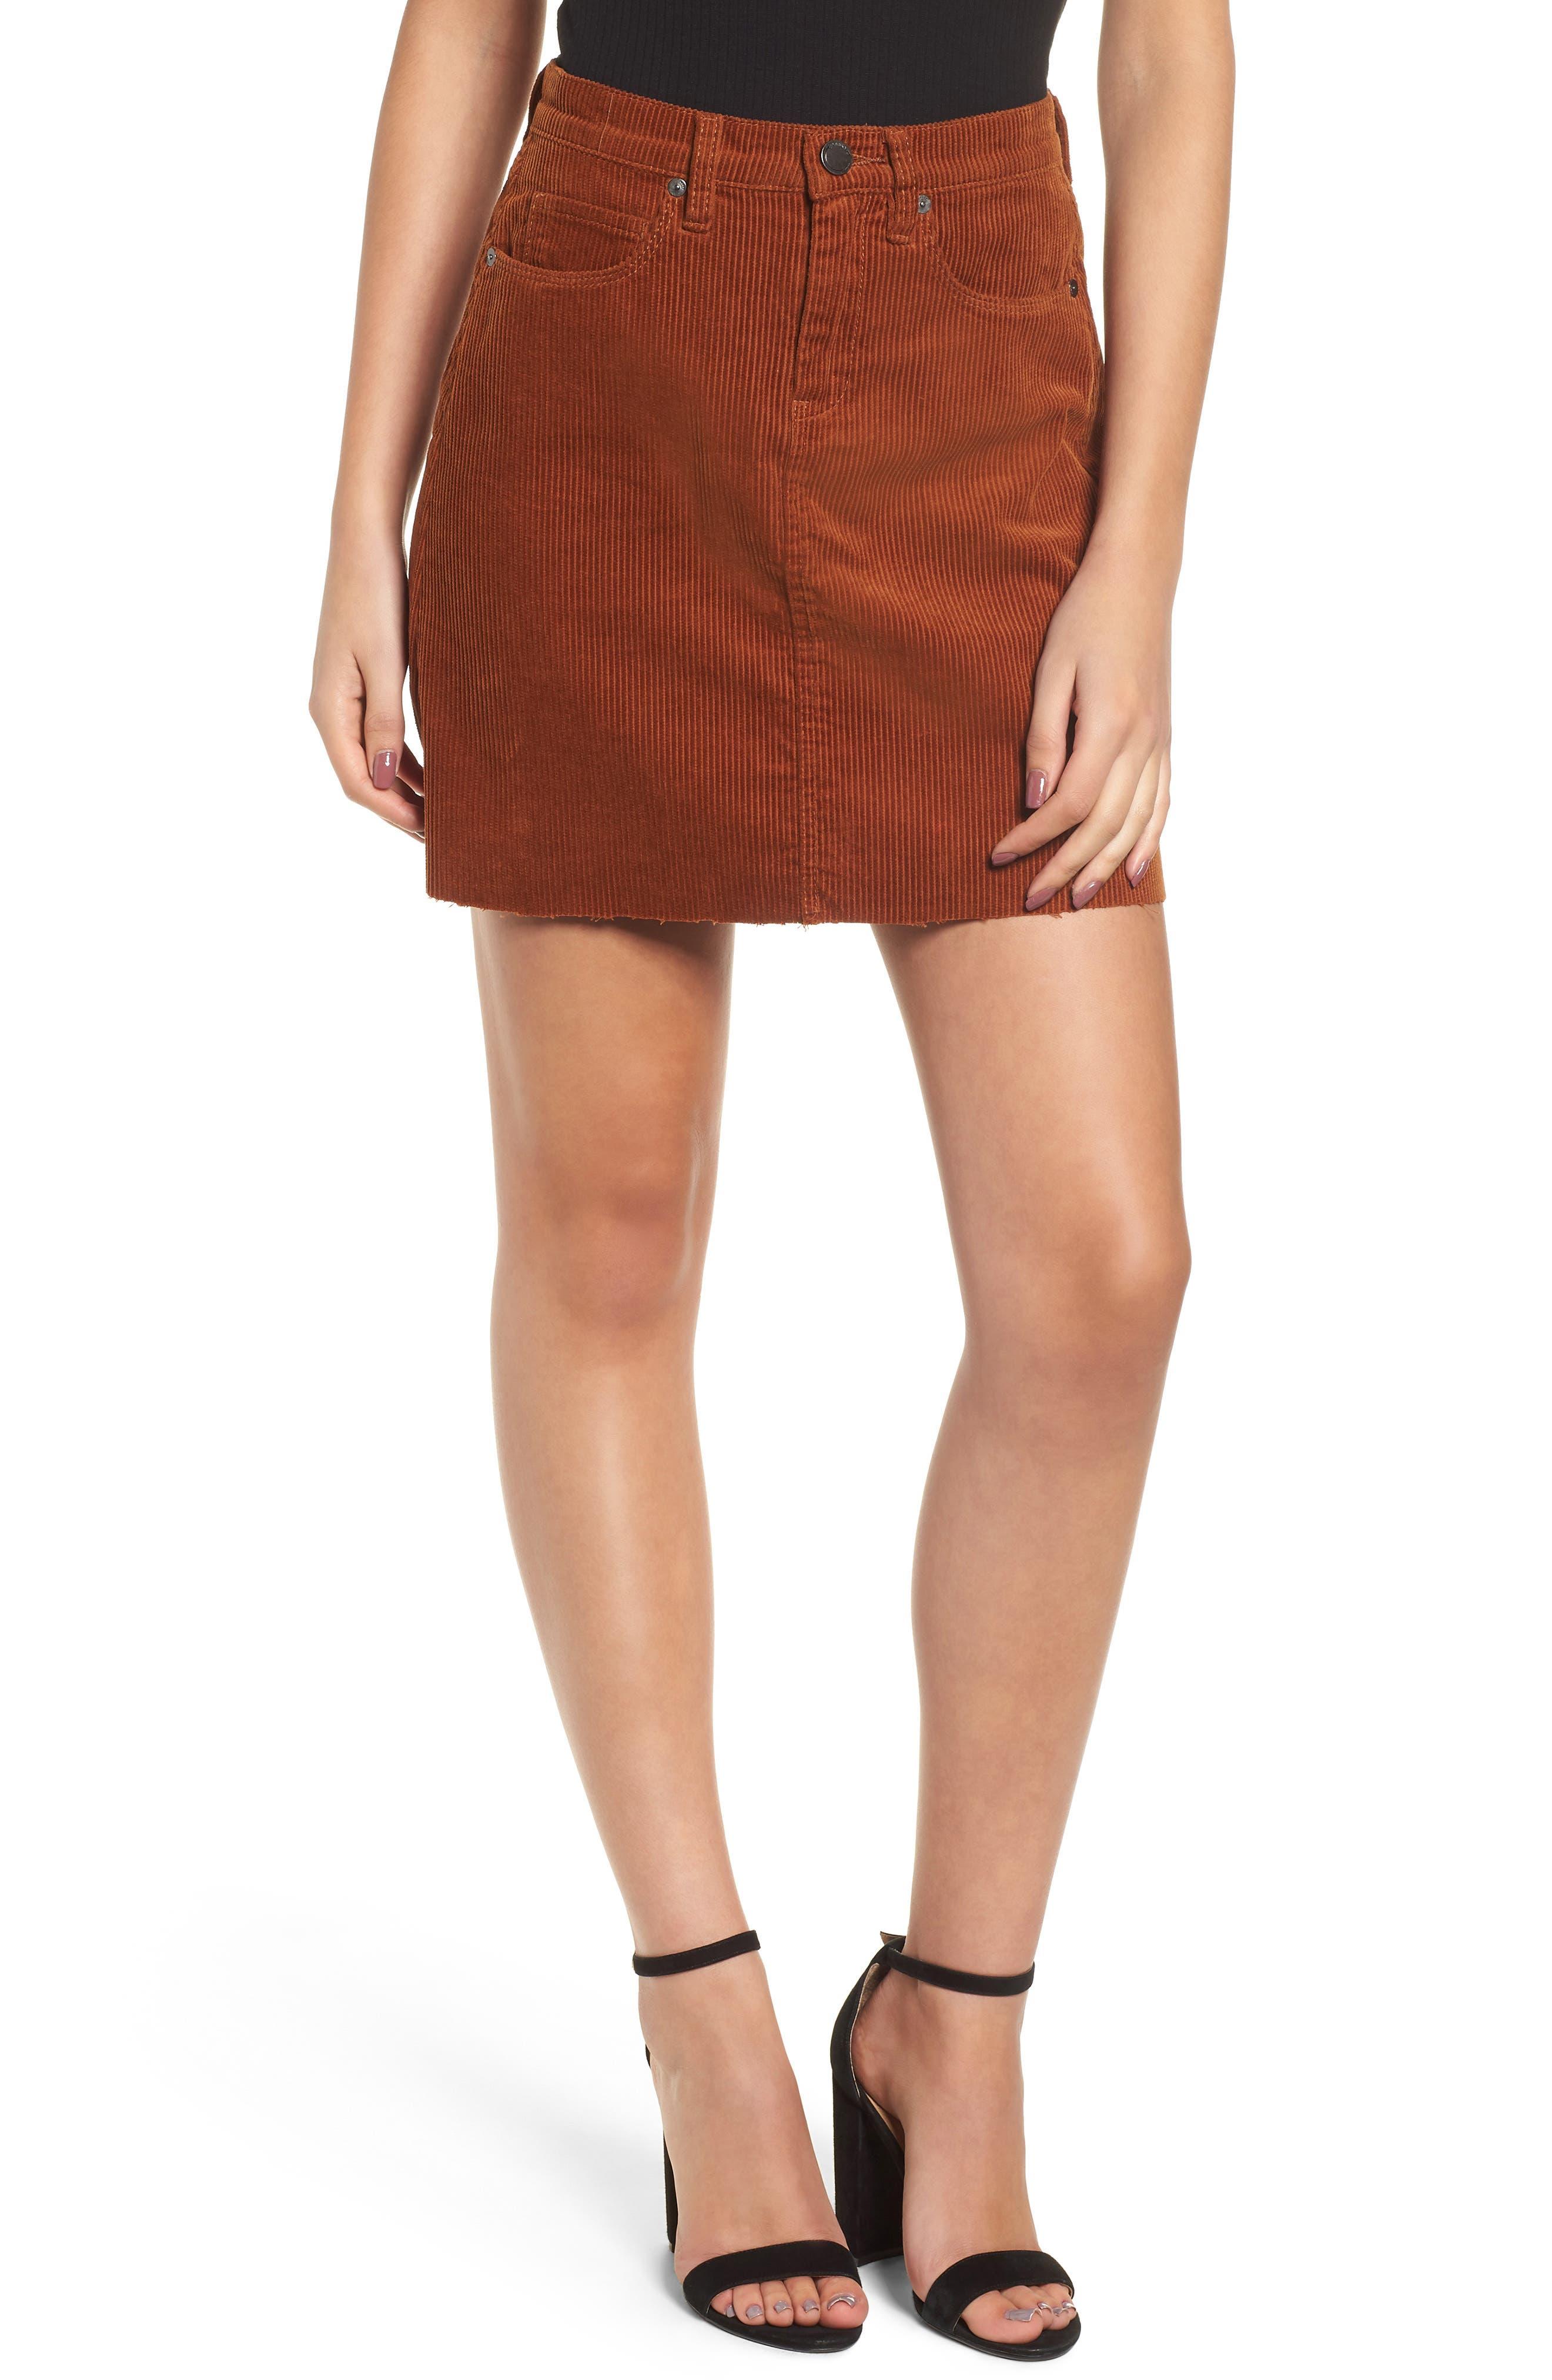 Blanknyc Corduroy A-Line Miniskirt, Metallic